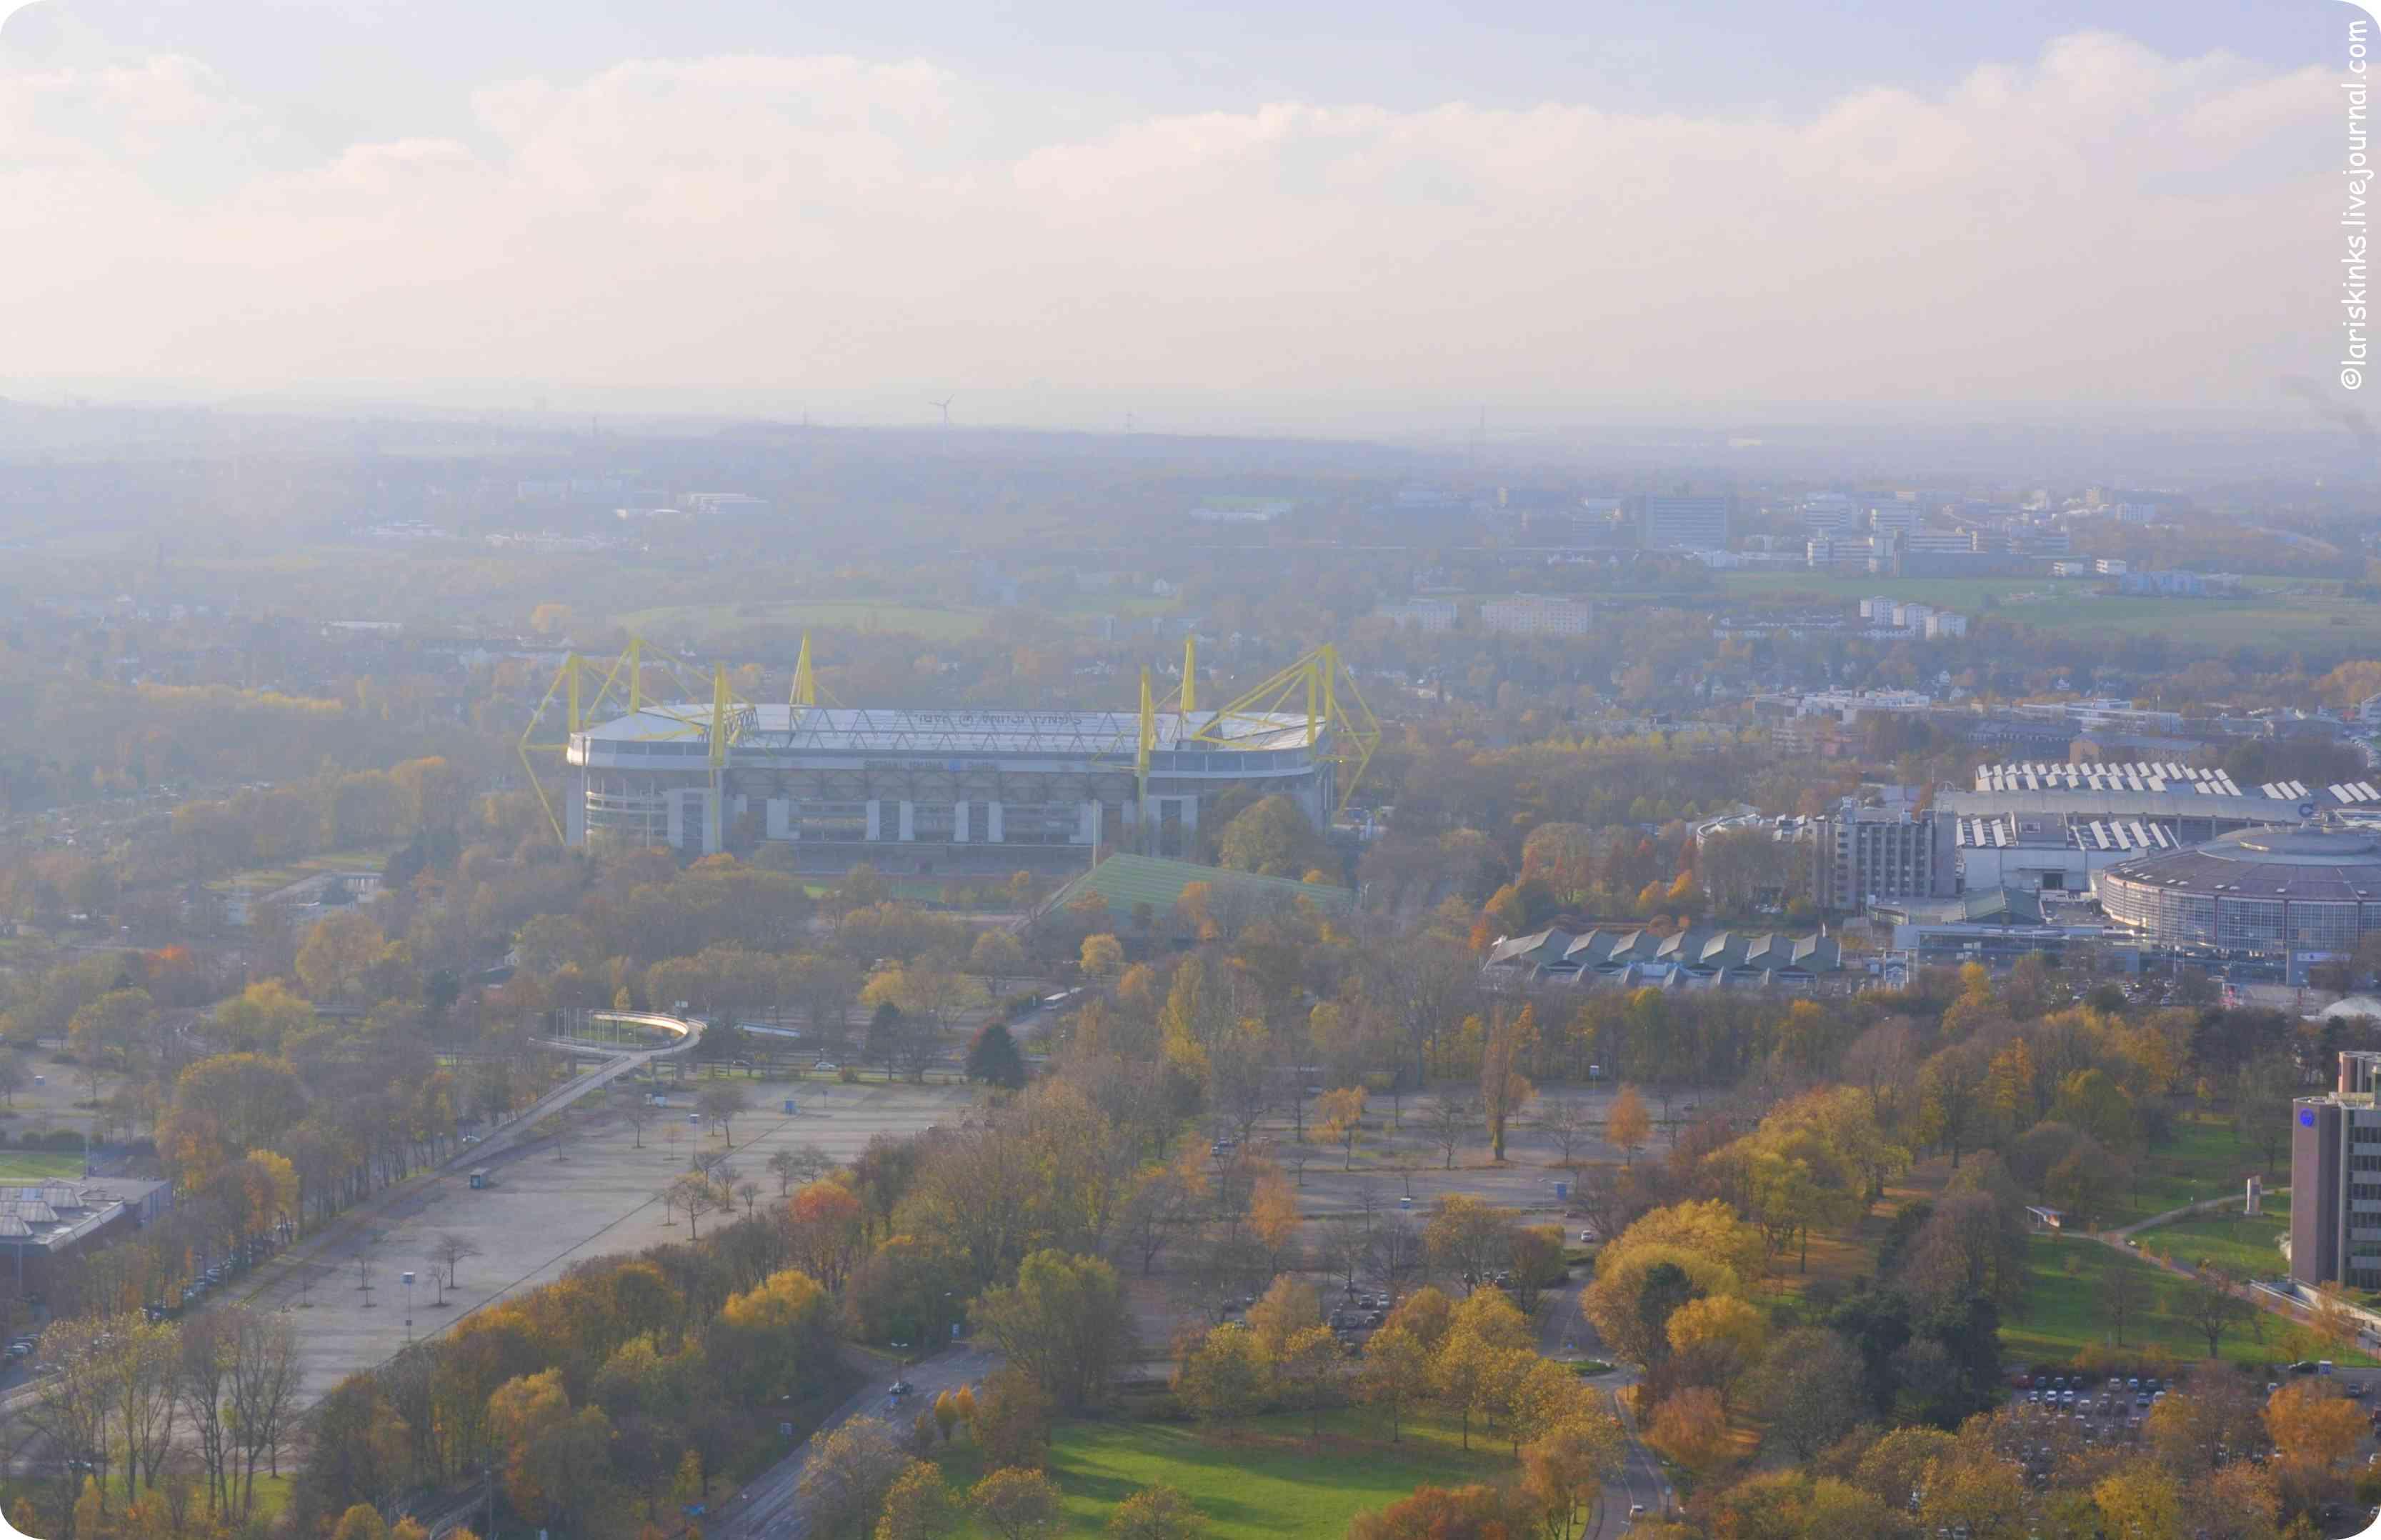 вид на  Вестфаленштадион, Дортмунд (Westfalenstadion, Dortmund)